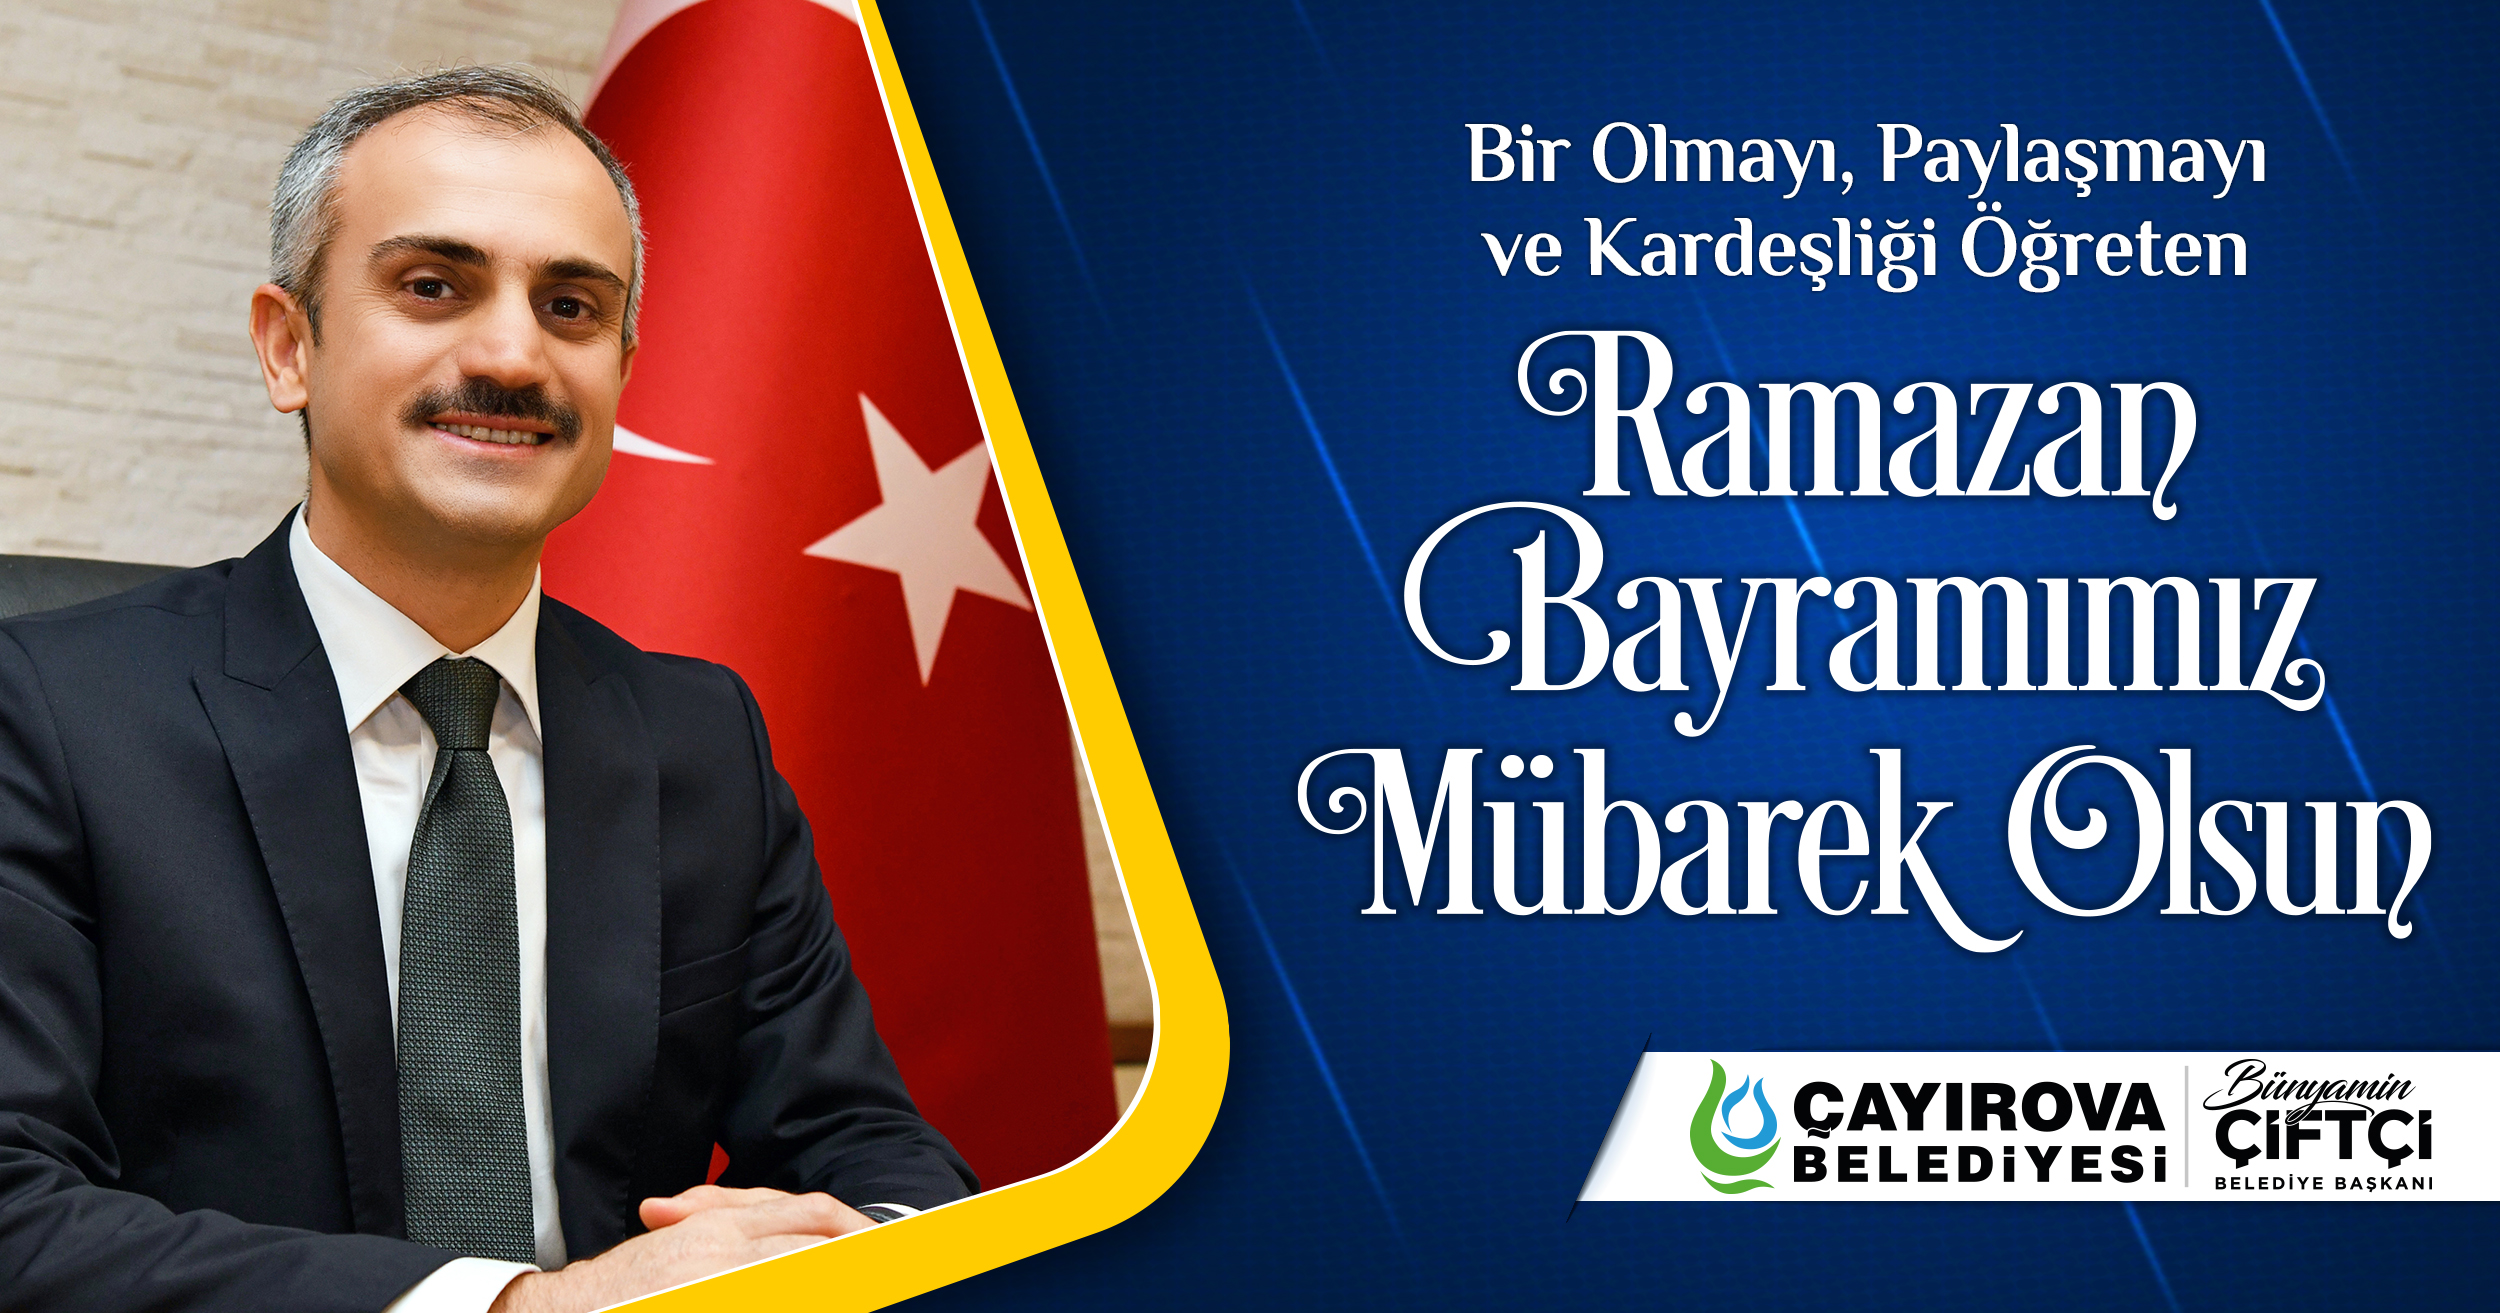 ramazan-bayrami-website-reklam-(1).jpg